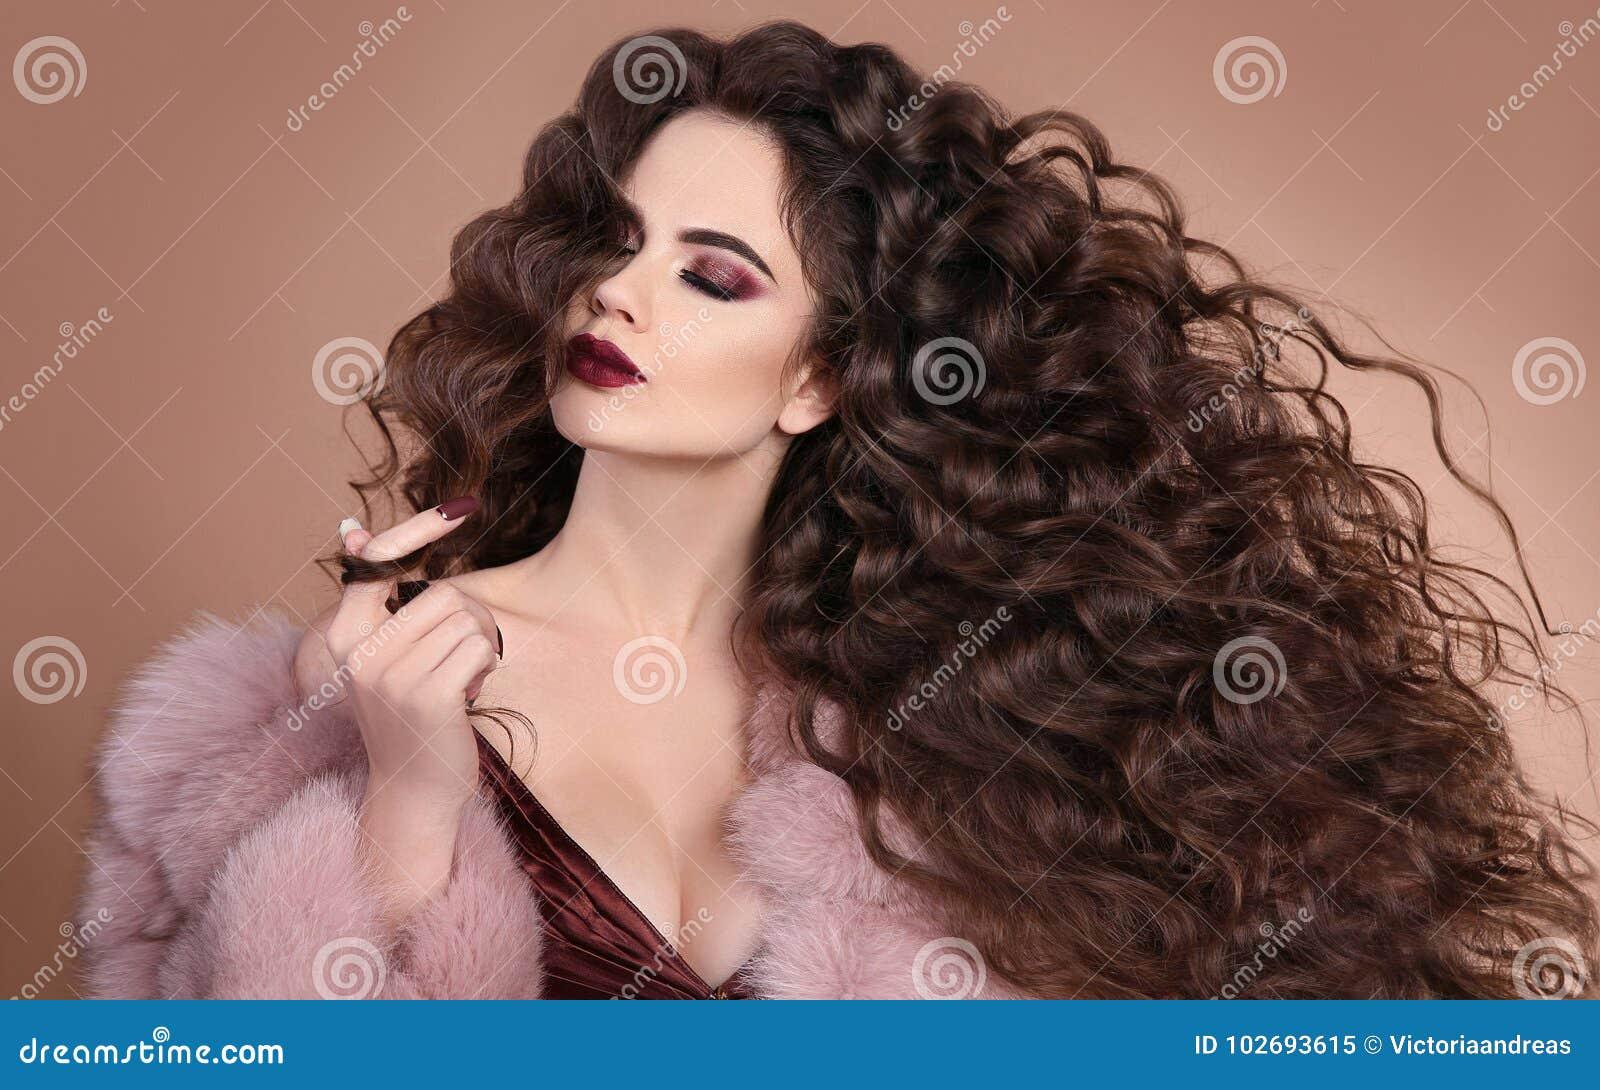 Hairstyle Κορίτσι brunette μόδας με τη μακριά σγουρή τρίχα, ομορφιά μΑ